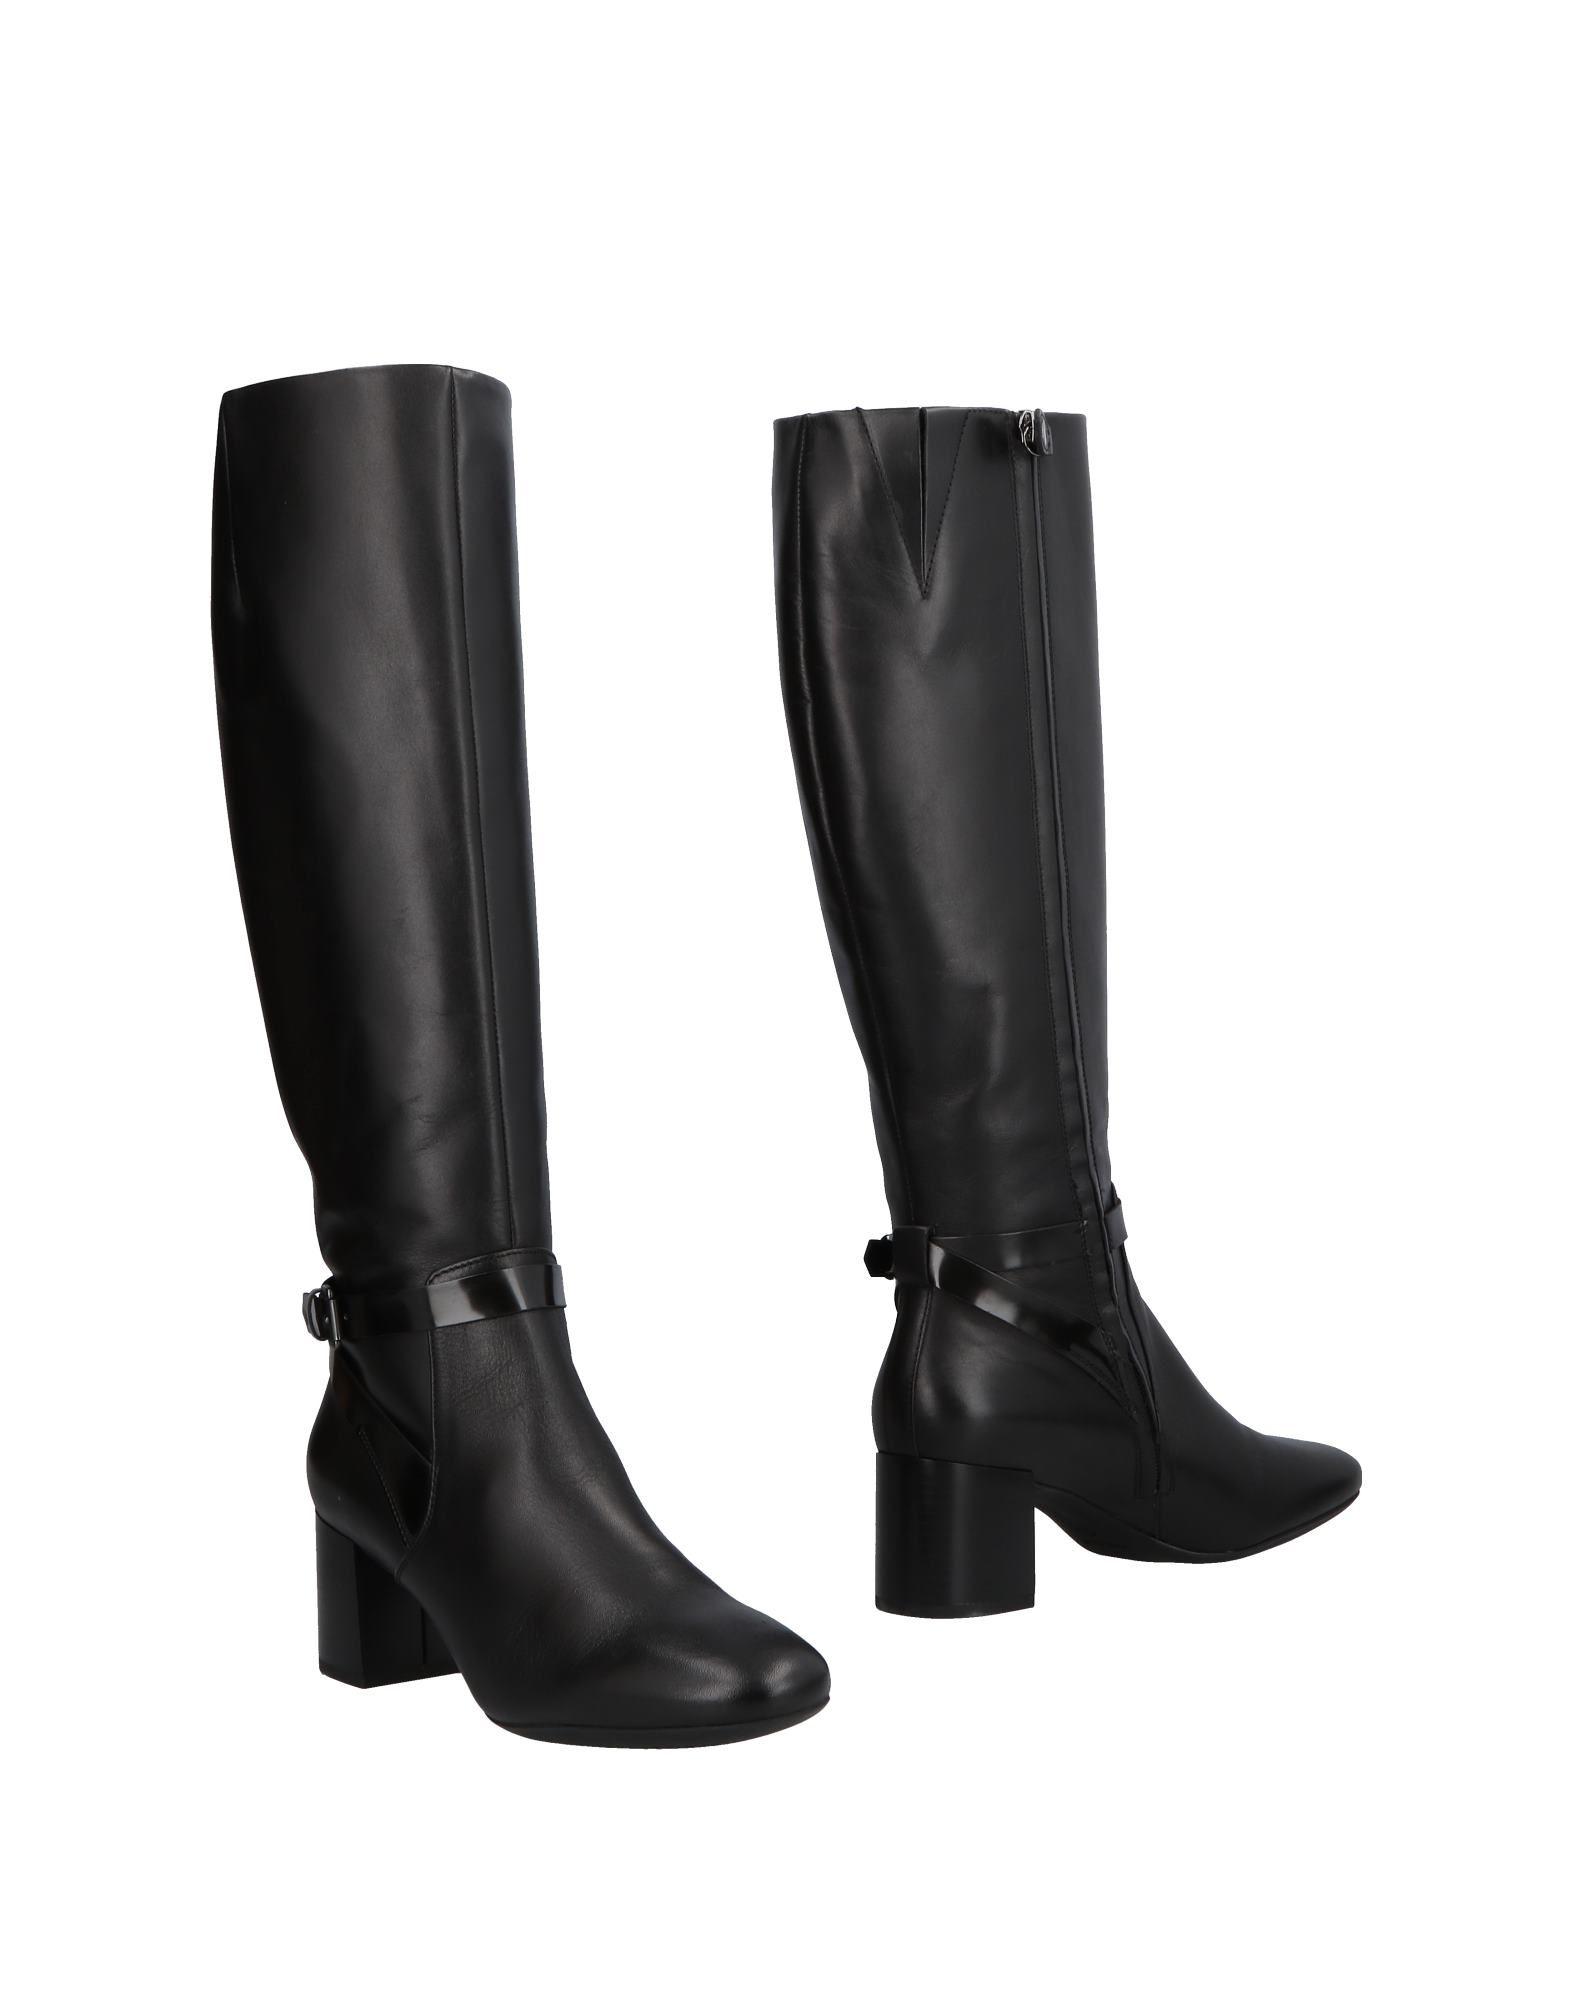 Moda Stivali Geox Donna - 11499128BS